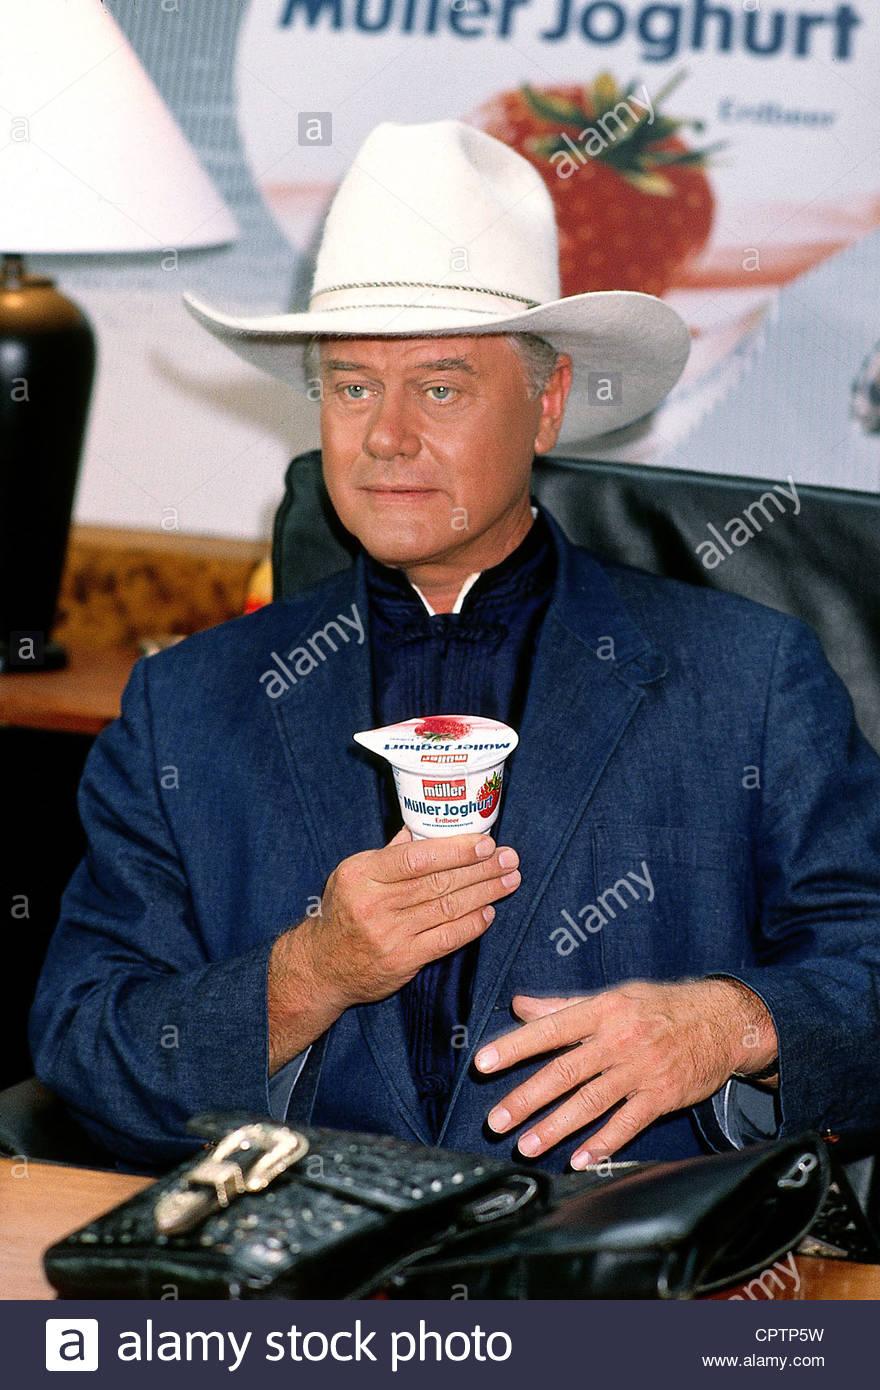 Hagman, Larry, * 21.9.1931, US actor, half length, advertising for German Mueller yogurt, 1980s, yoghurt, cowboy, - Stock Image